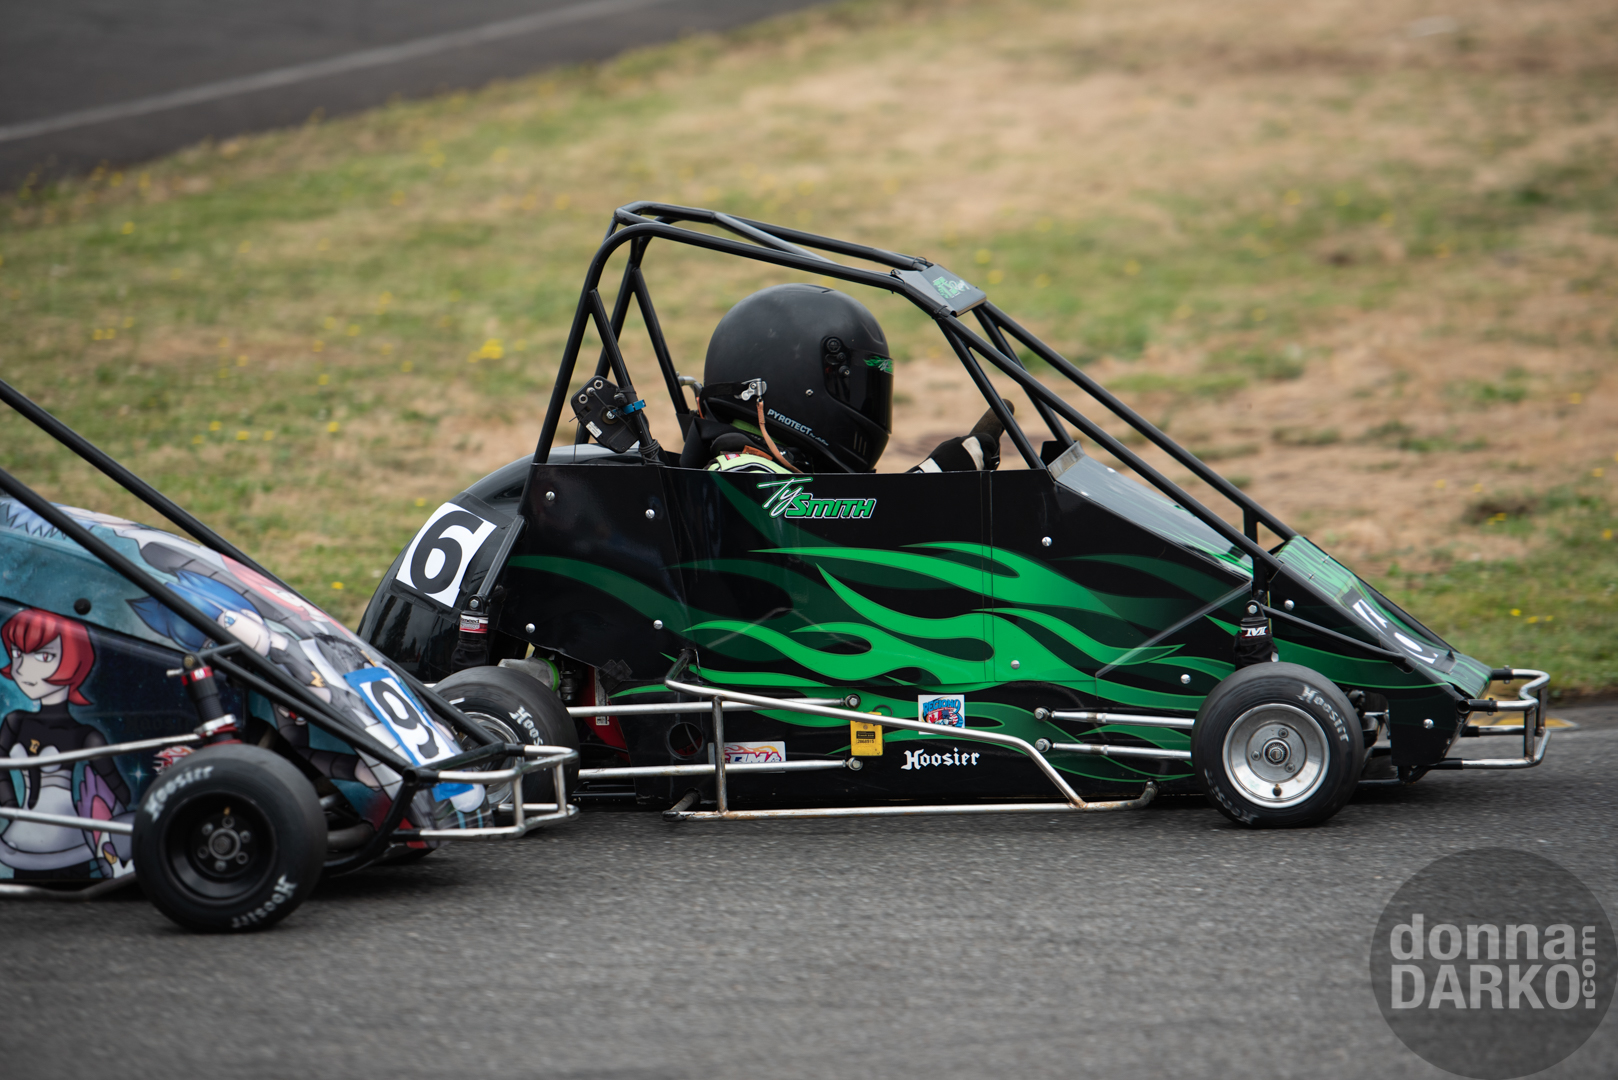 QWMA (Racing) 8-11-2019 DSC_6469.jpg